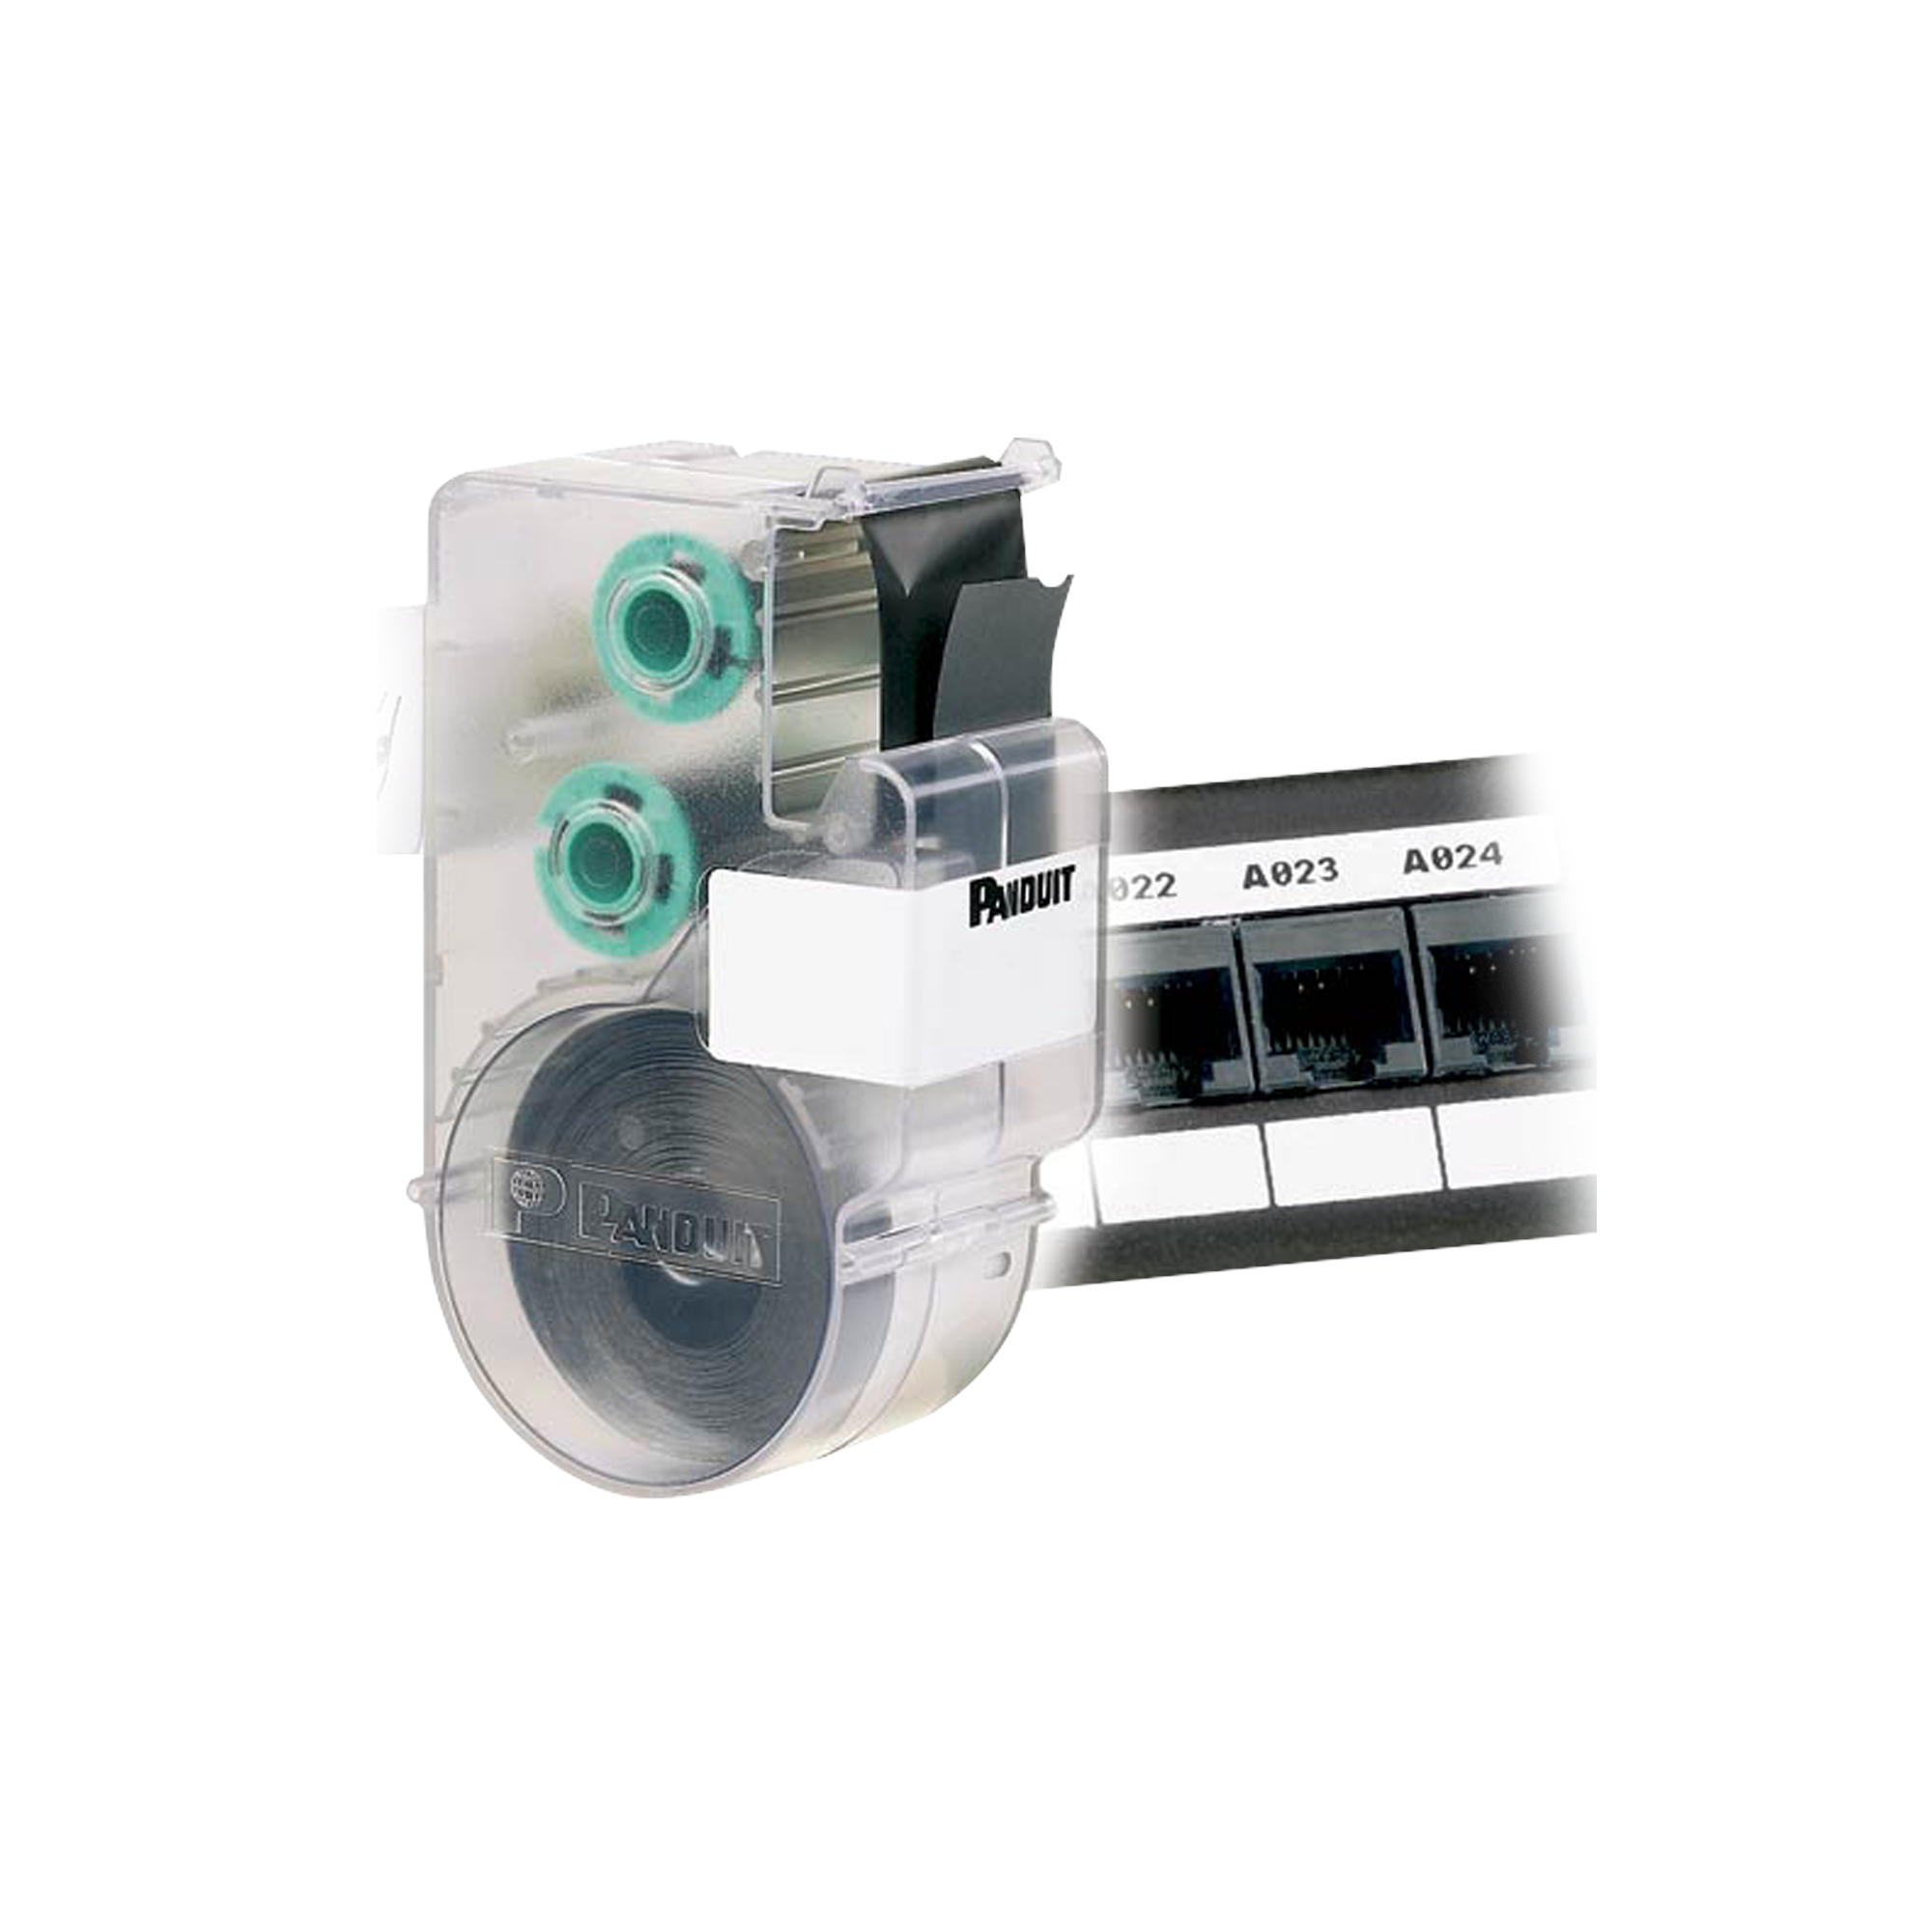 Casete de Etiquetas para Línea Ultimate ID de Panduit, Material Poliéster, no Adhesivas, Rollo de 7.6m, Color Blanco